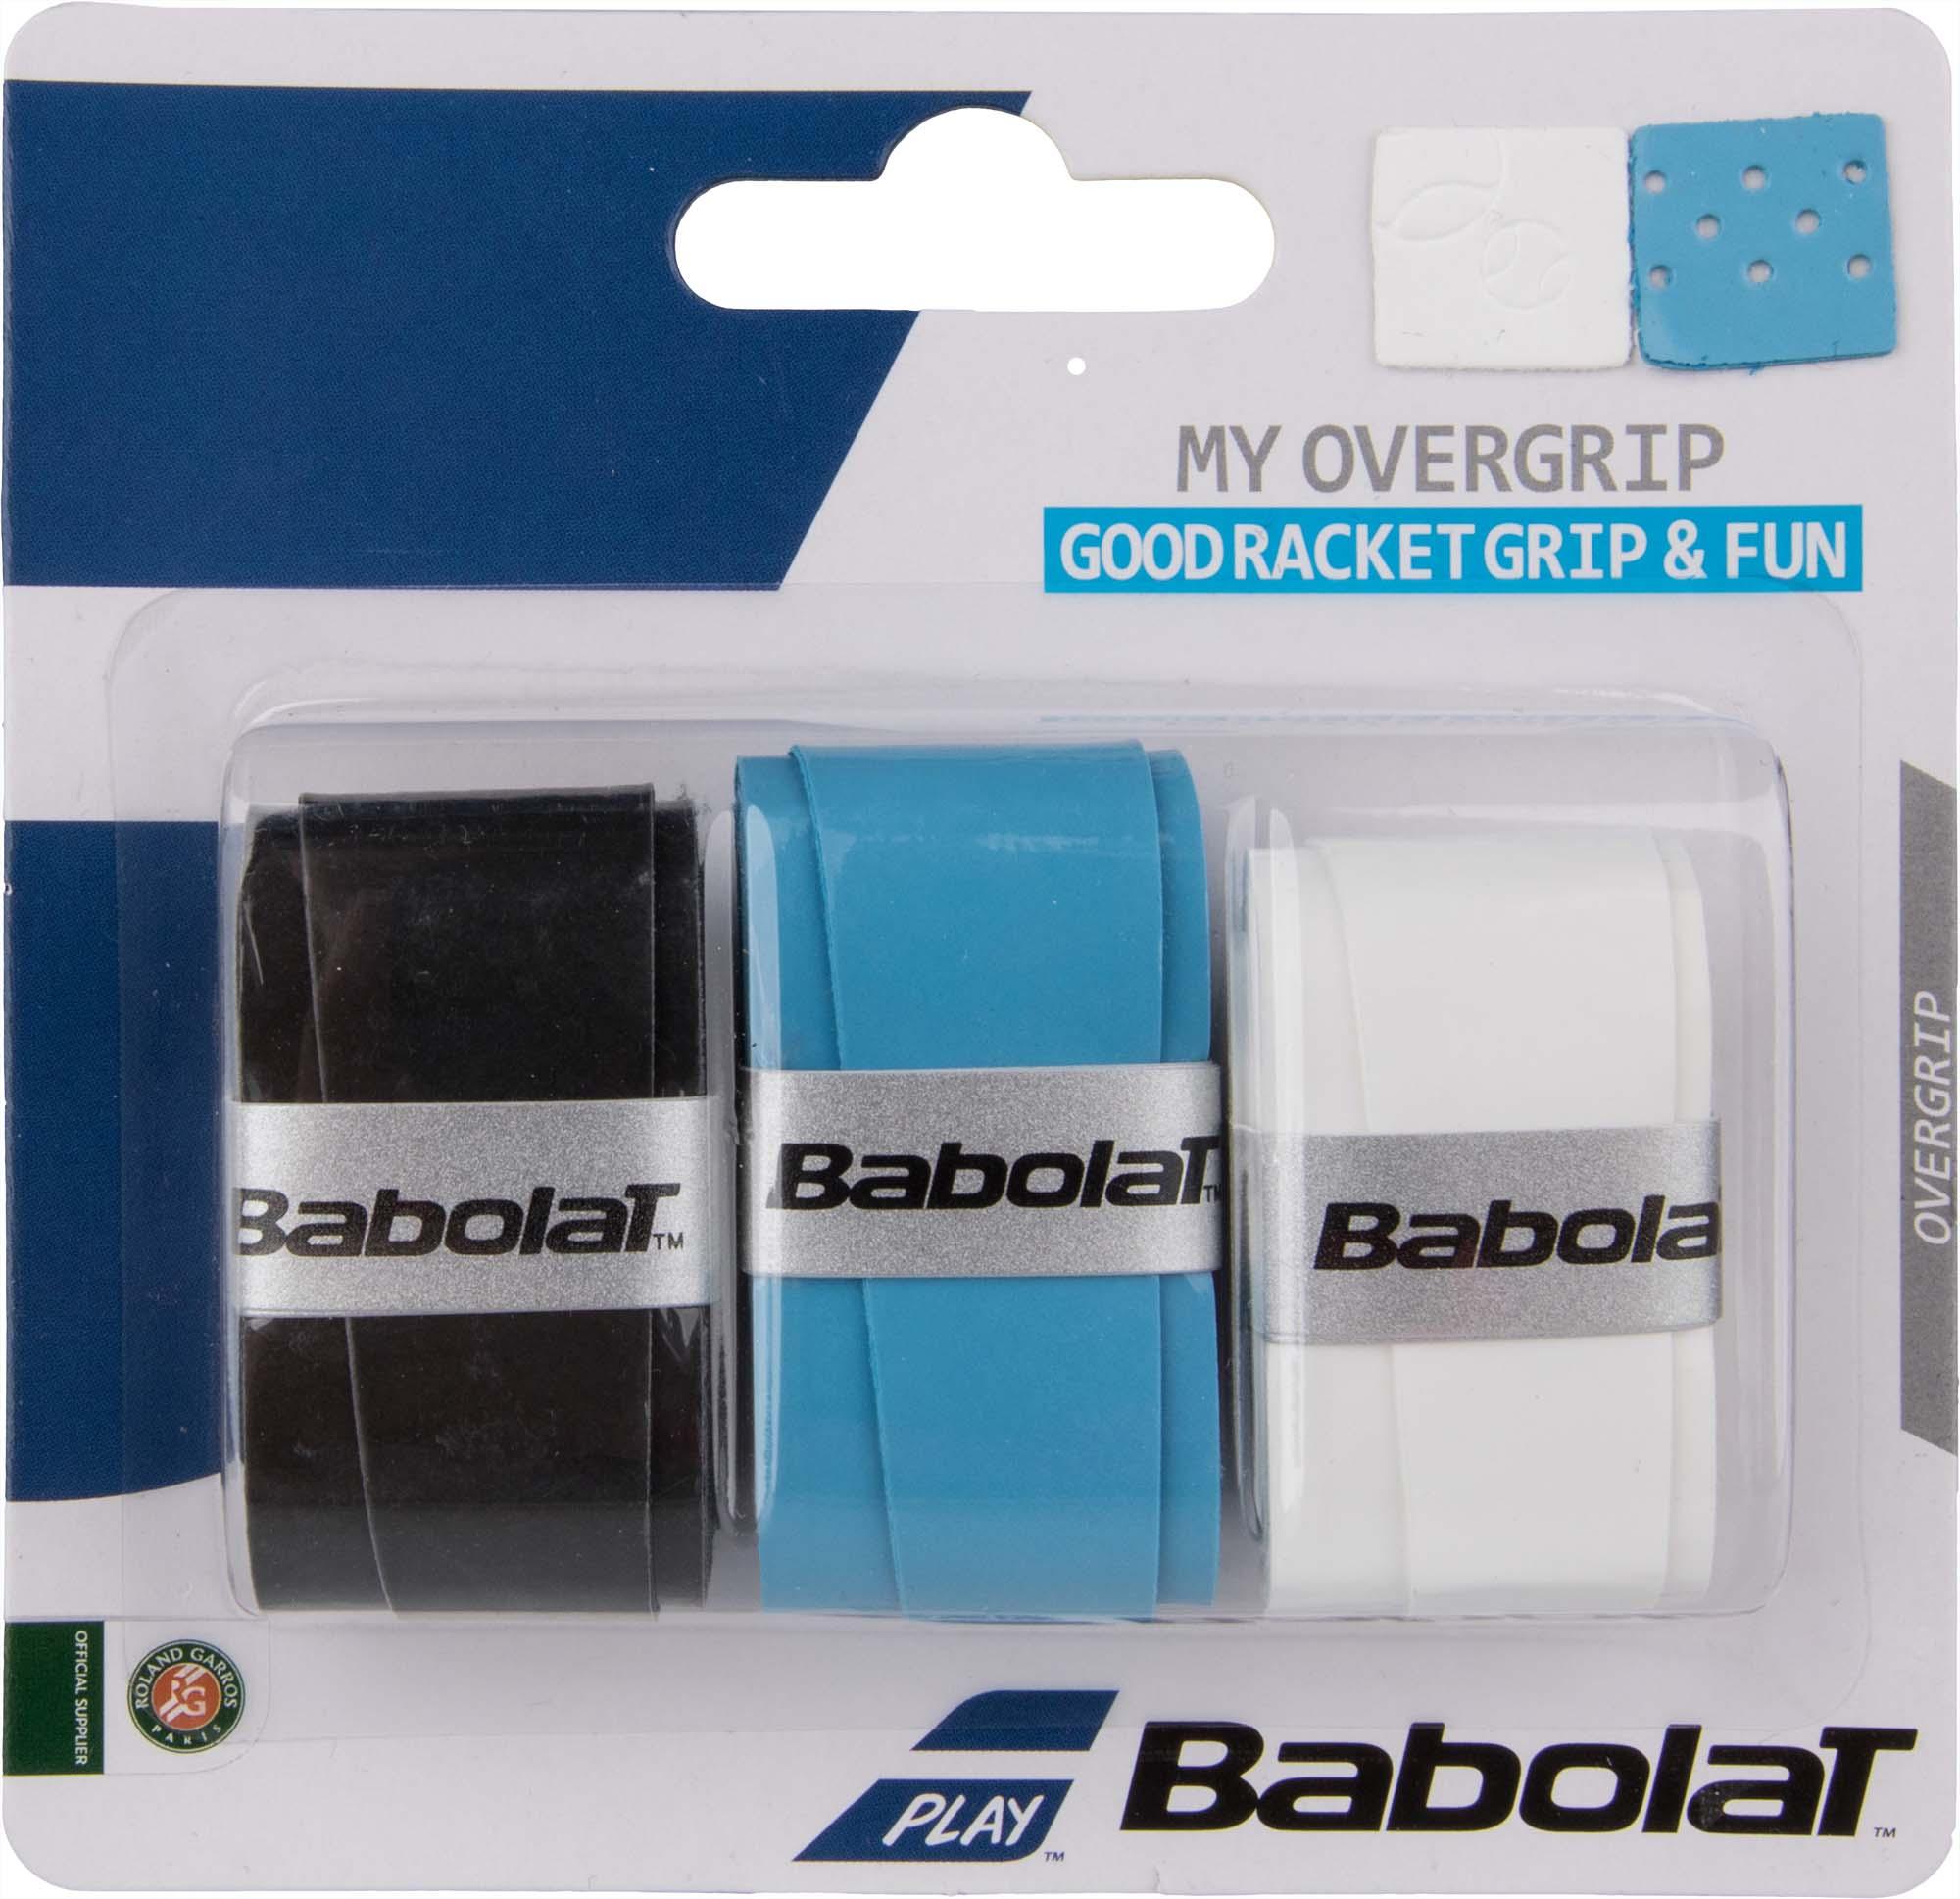 Tennis grip tape